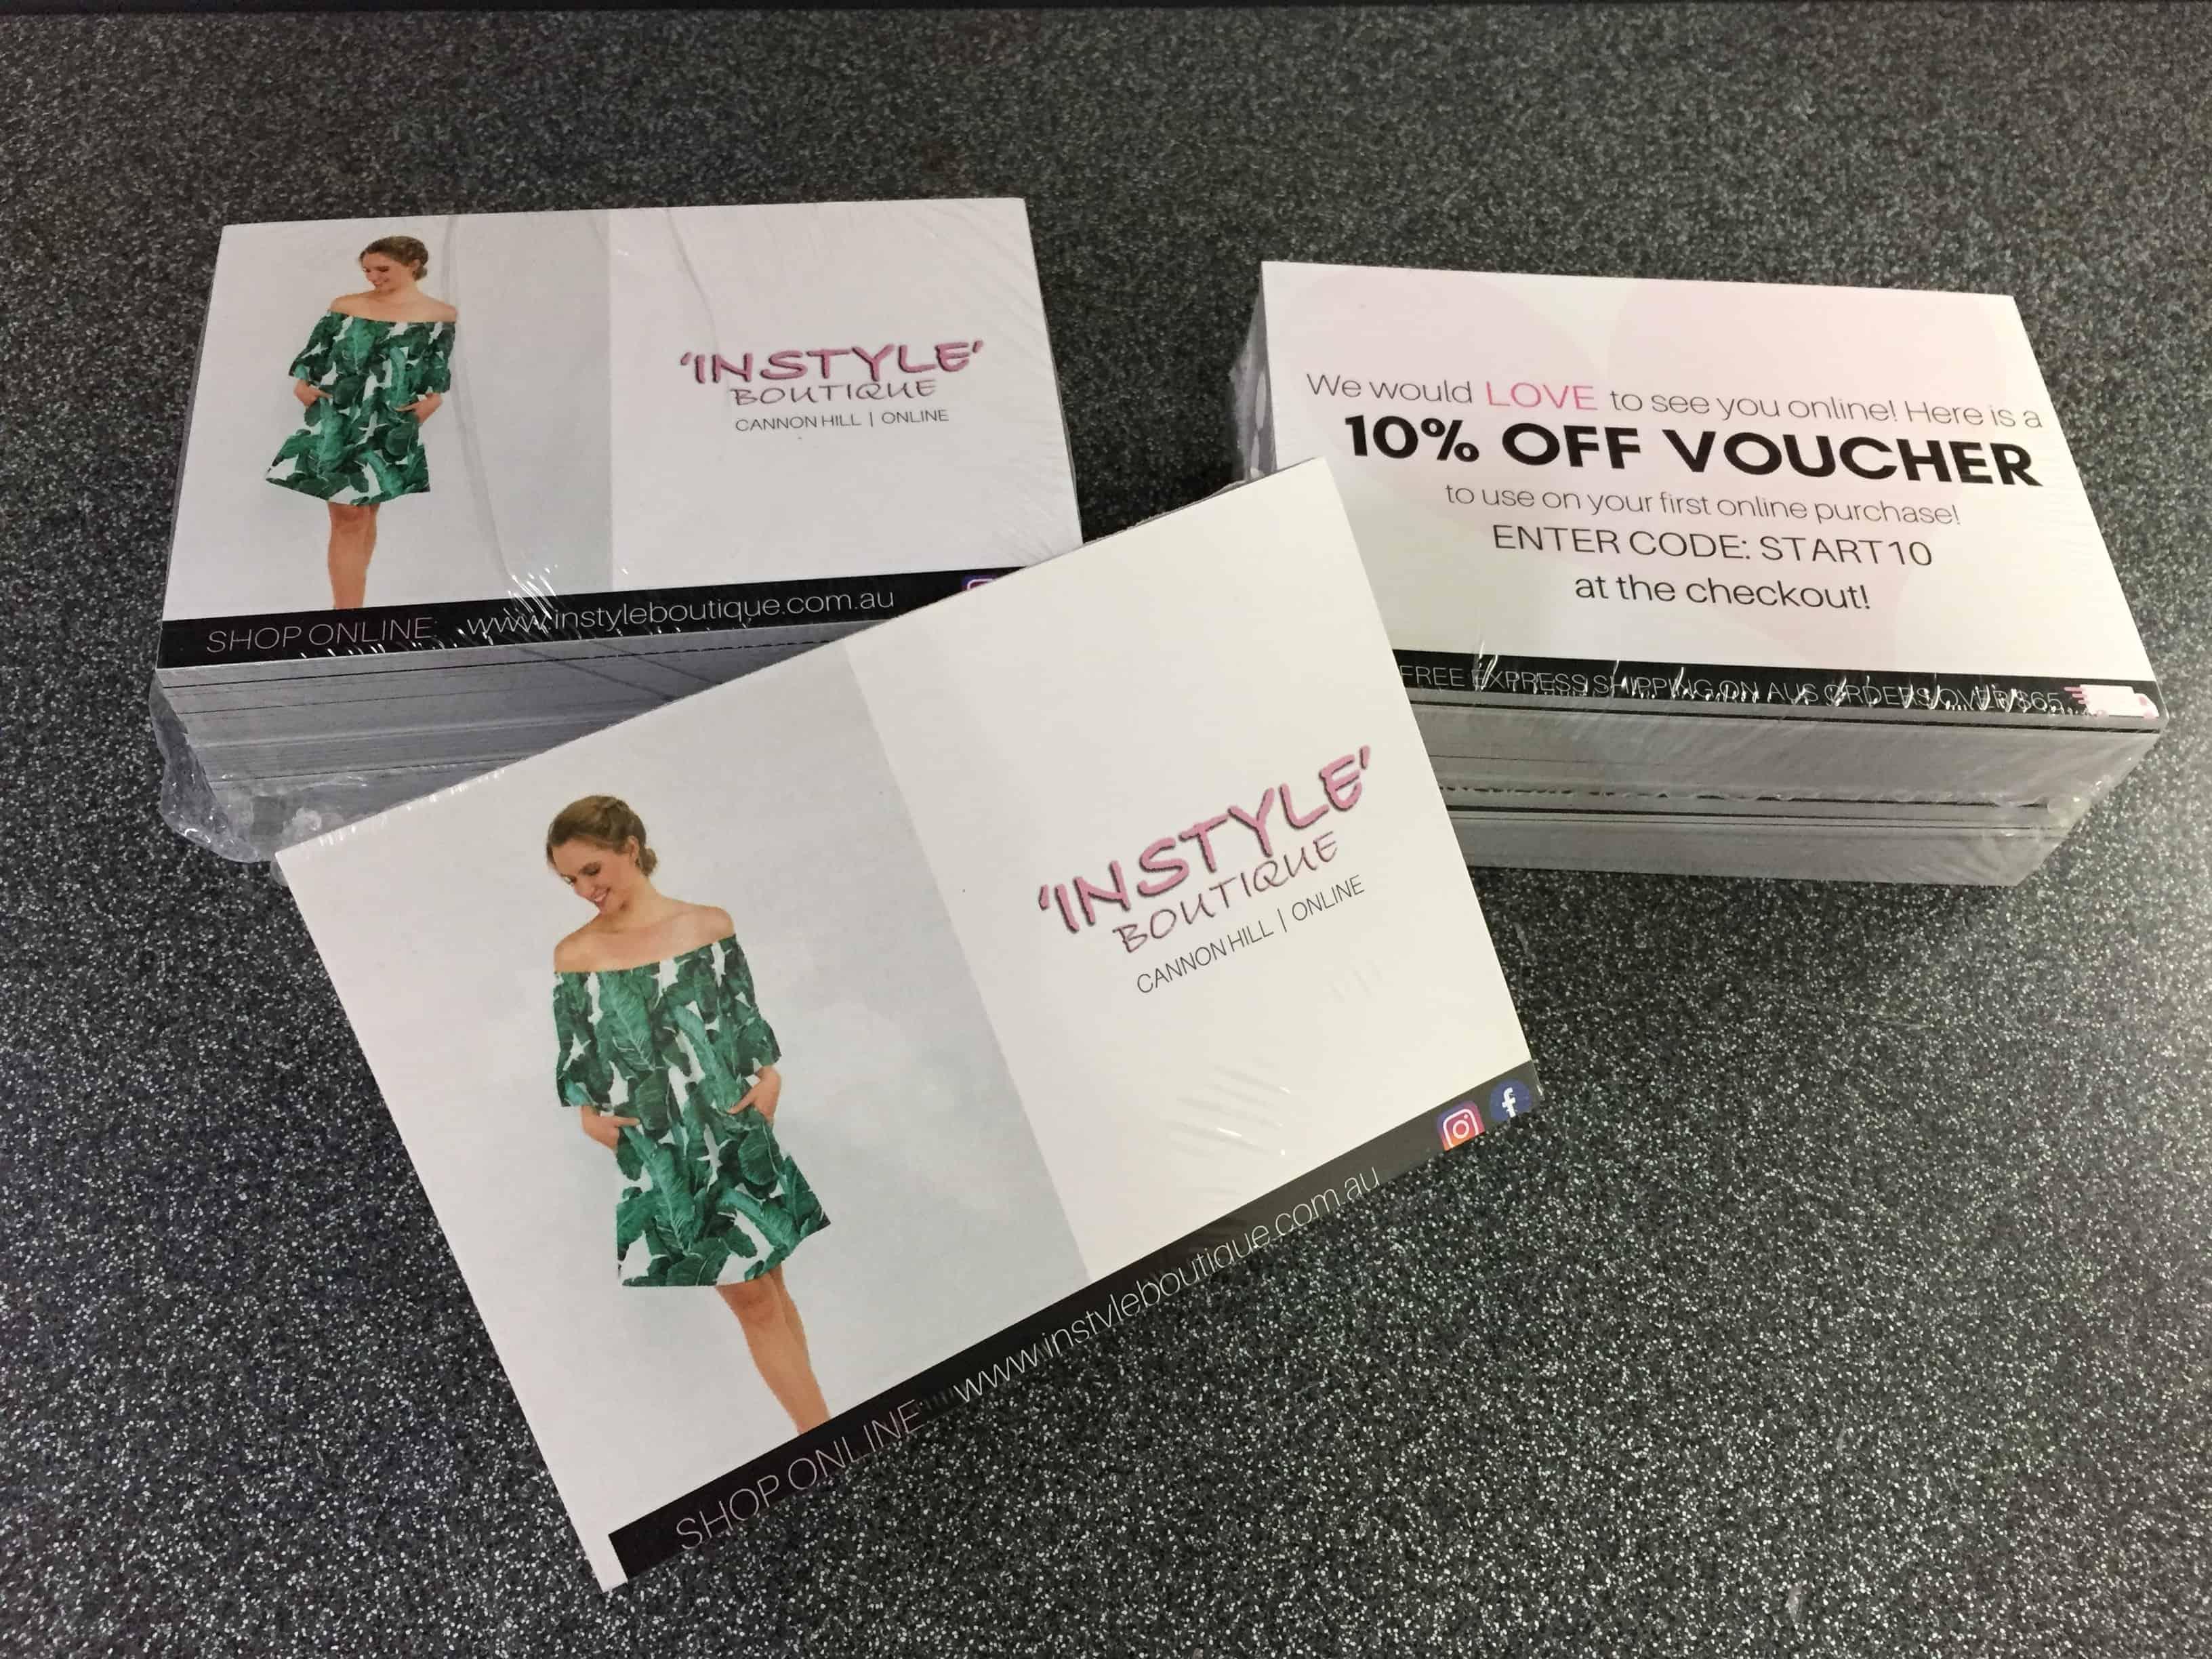 Seven Print - Promotional card printing Brisbane